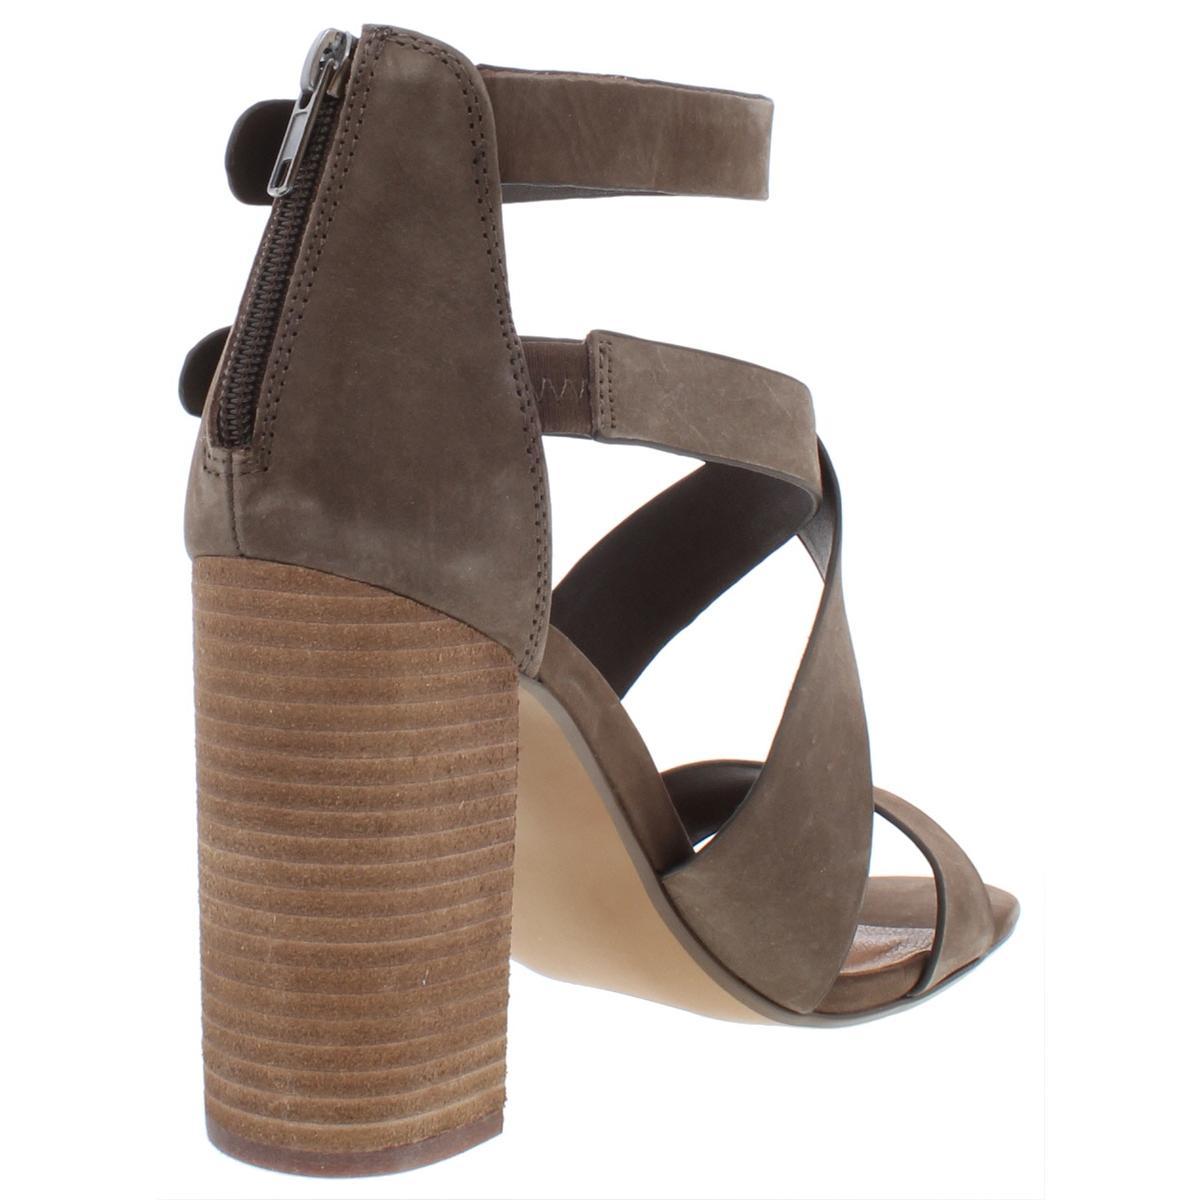 48c639bfa7e Steve Madden Women s Sundance Heeled Sandal Brown Nubuck Size 9.5 Xqo2.  About this product. Picture 1 of 4  Picture 2 of 4  Picture 3 of 4  Picture  4 of 4